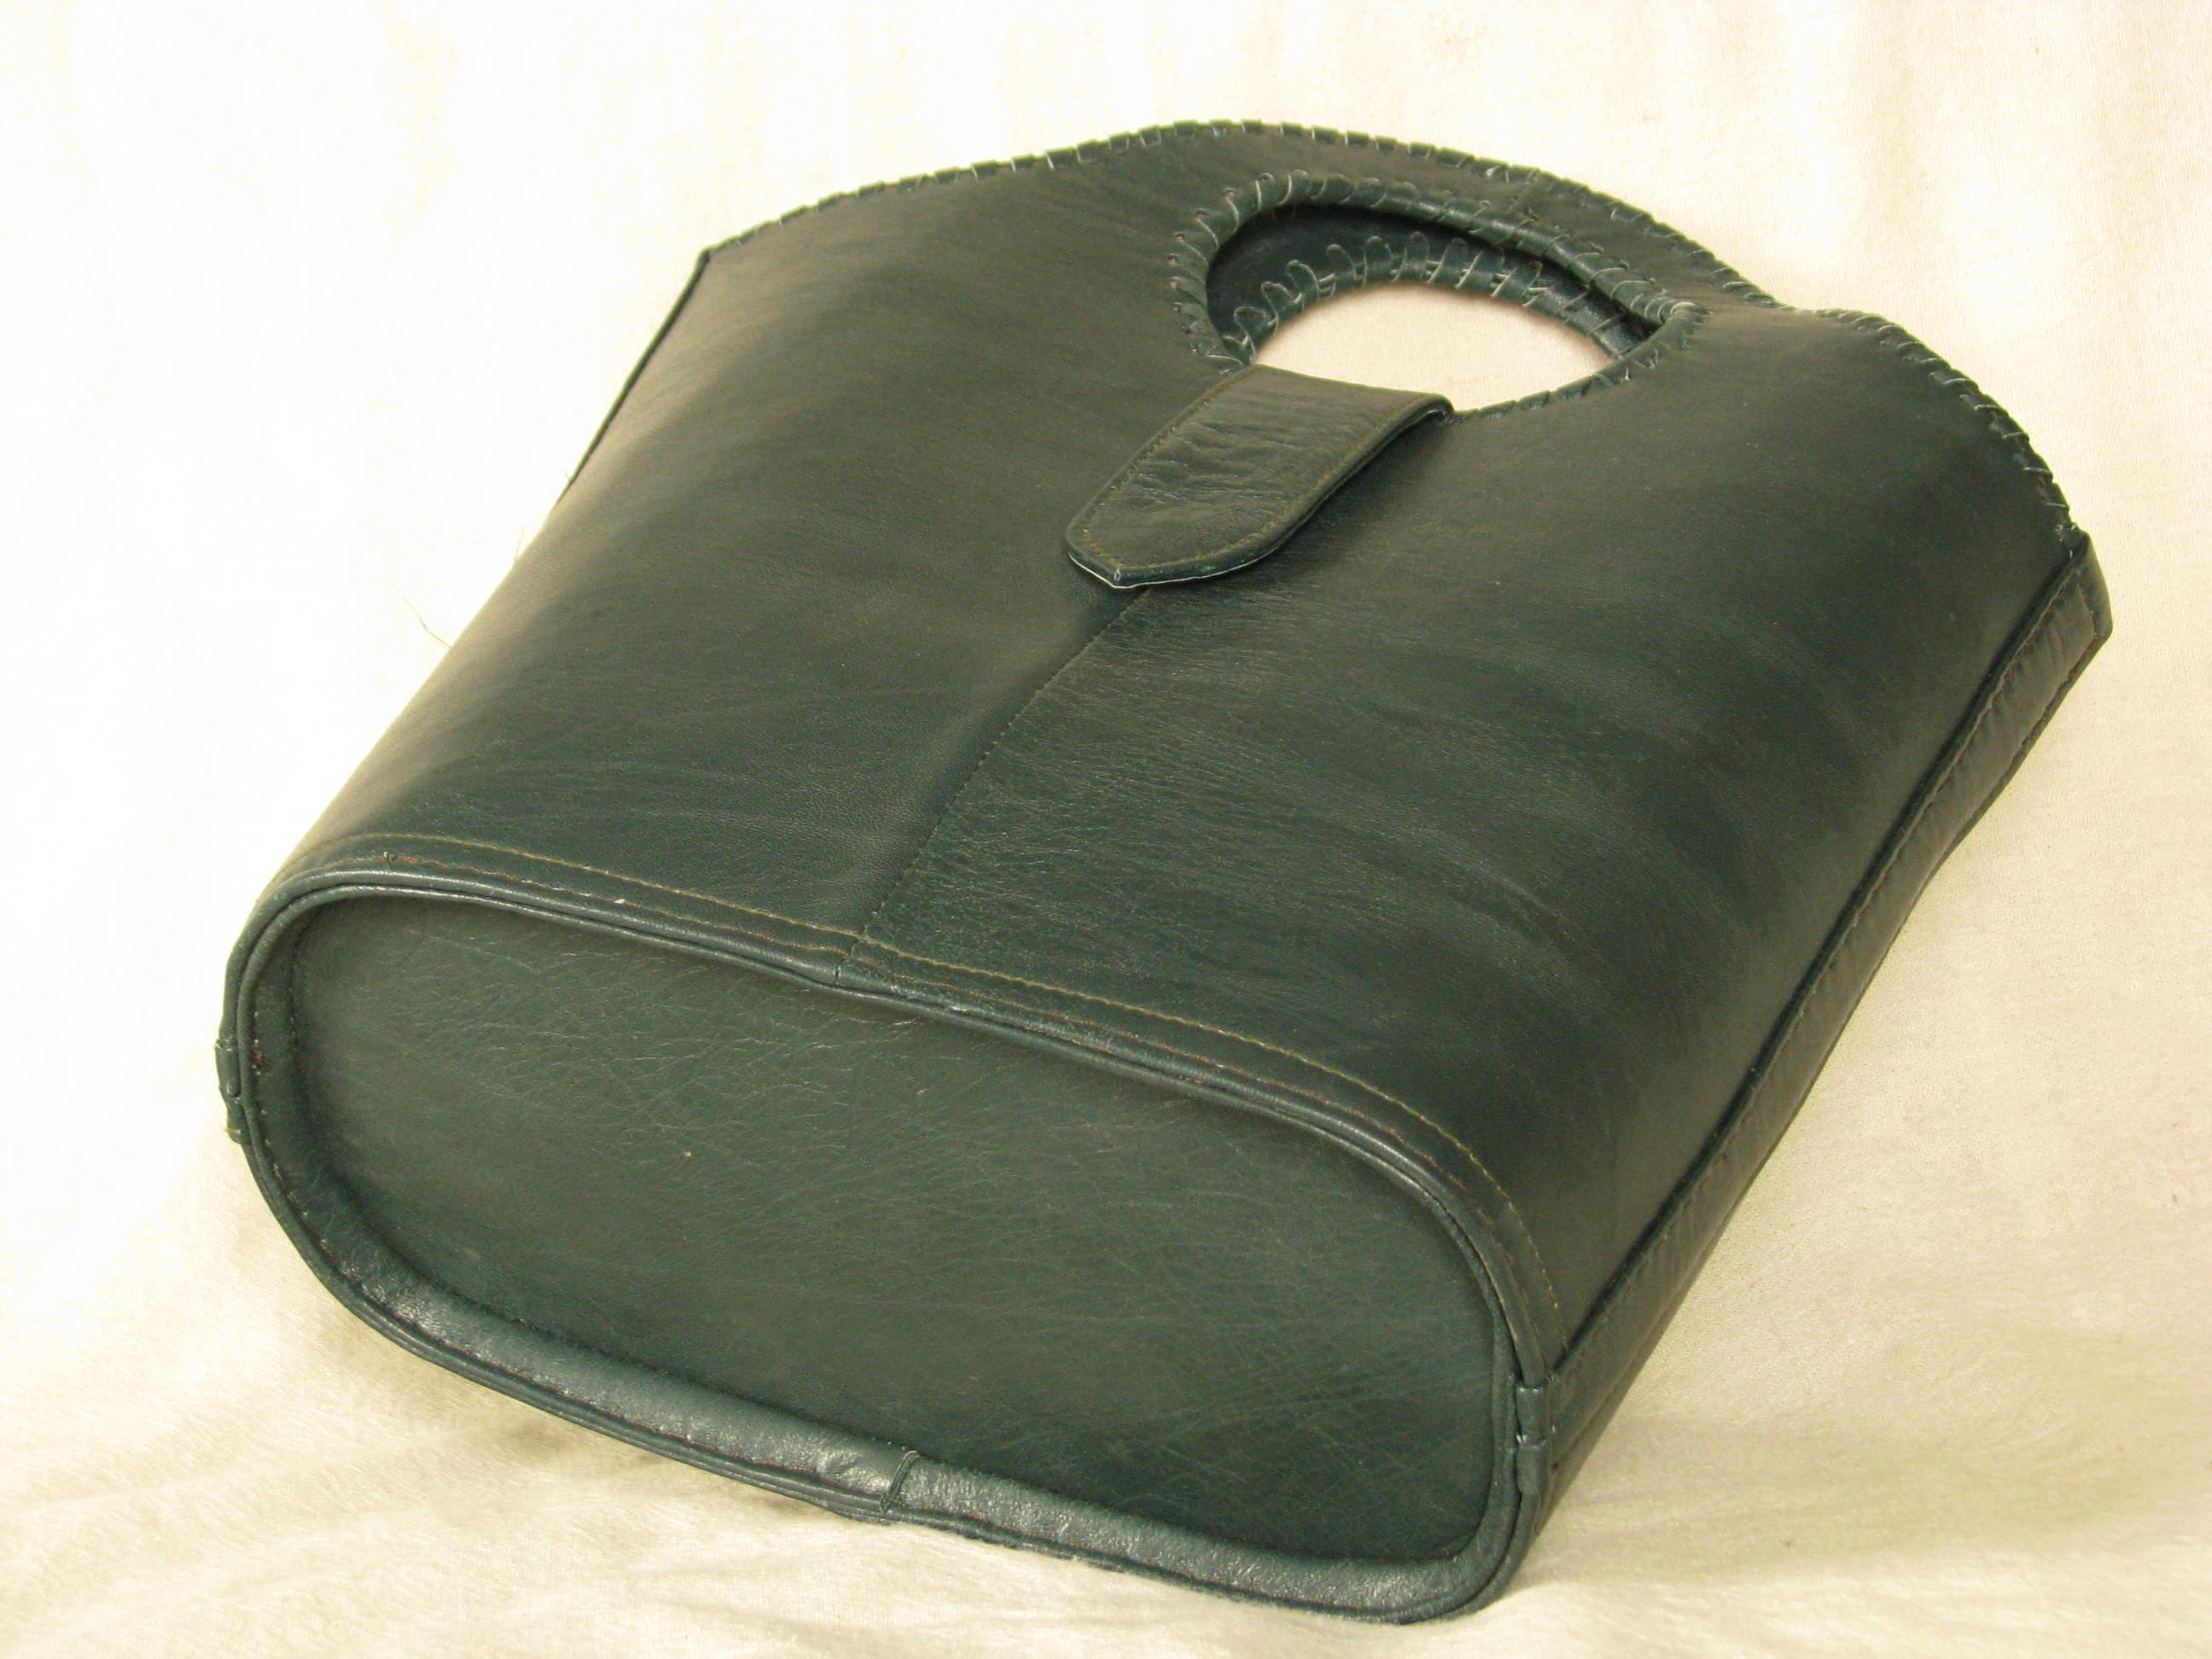 Gundara - dark-green shopping bag - genuine leather - made in Afghanistan - fair trade